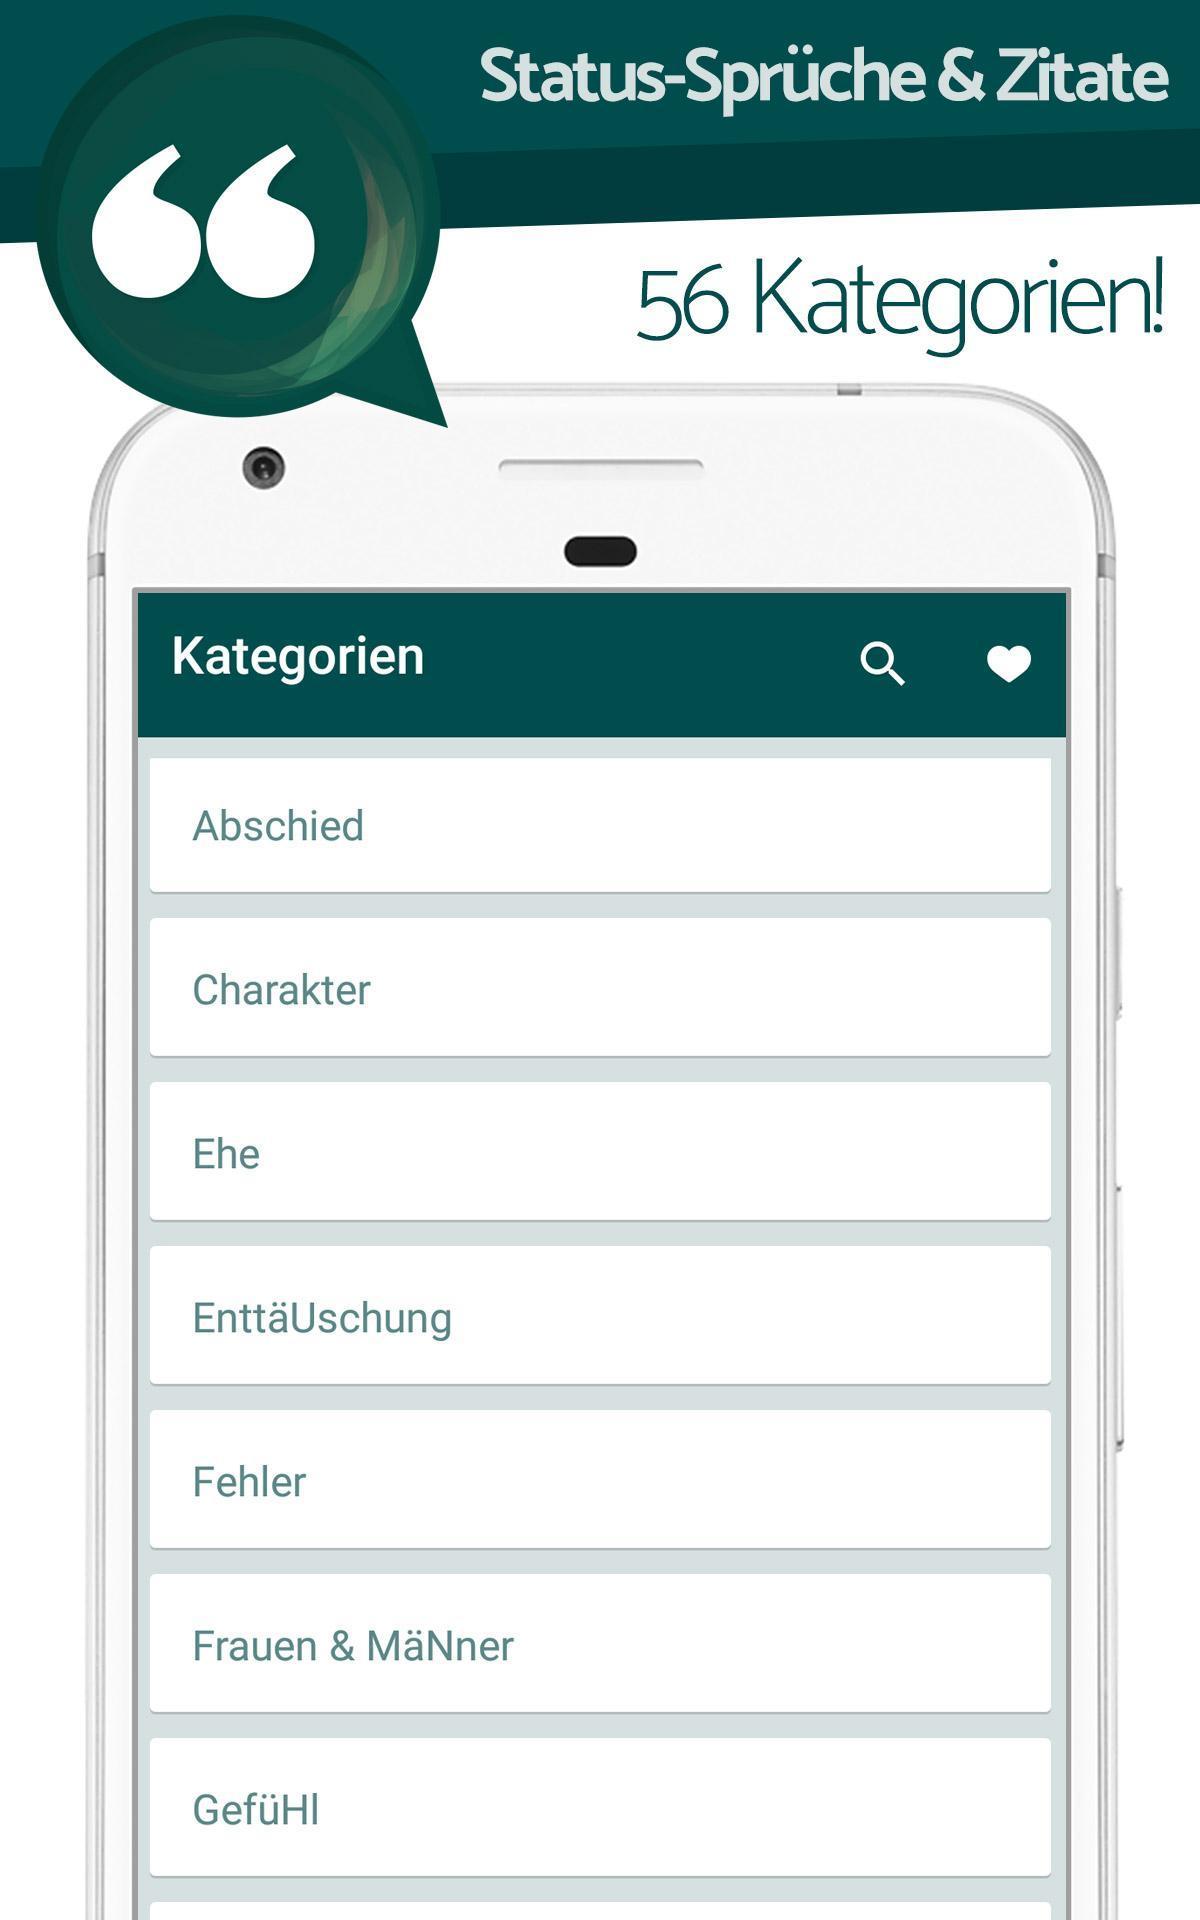 Status Sprüche Zitate для андроид скачать Apk